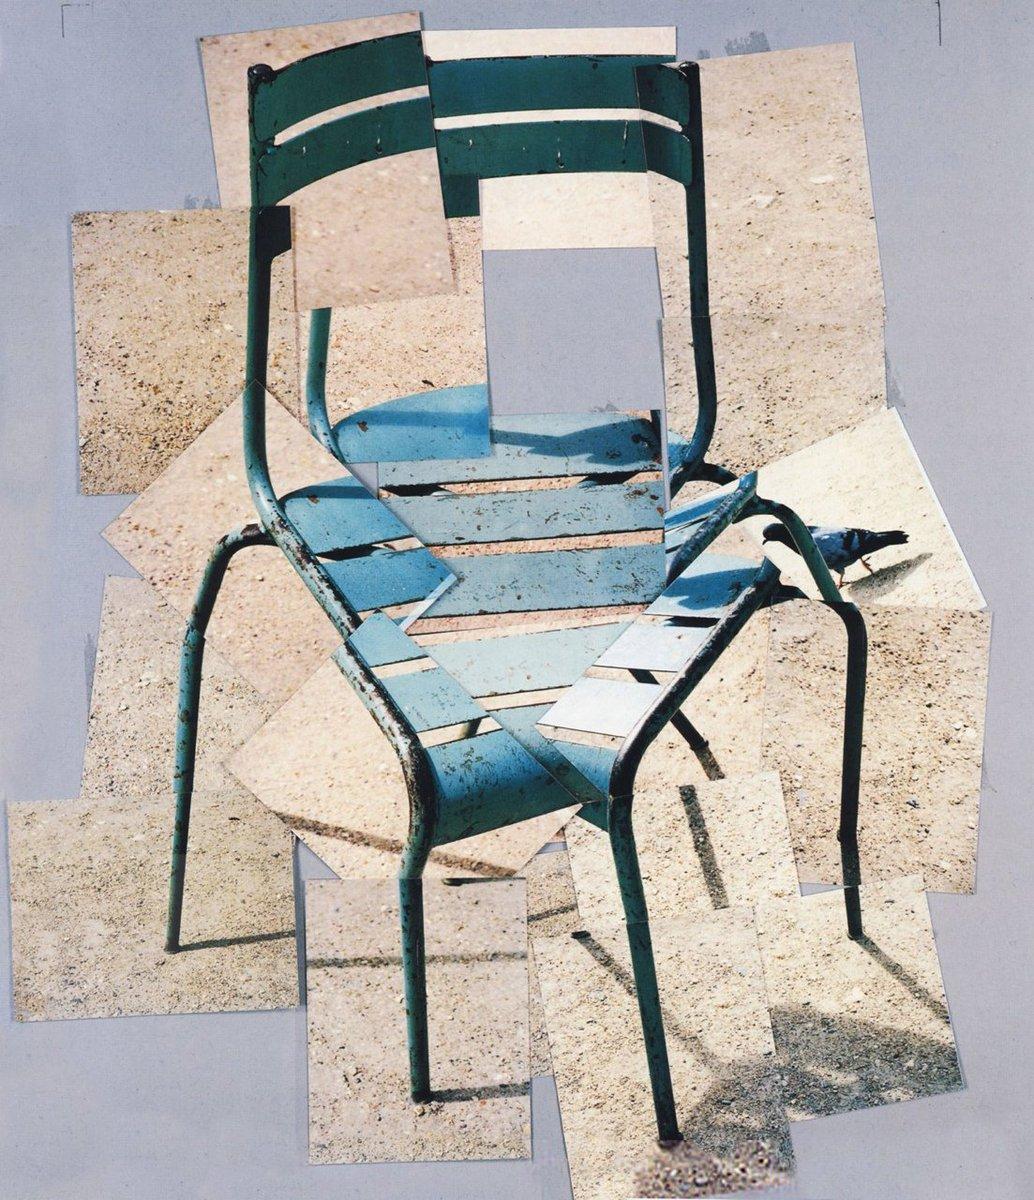 David Hockney, A Chair Jardin du Luxembourg'